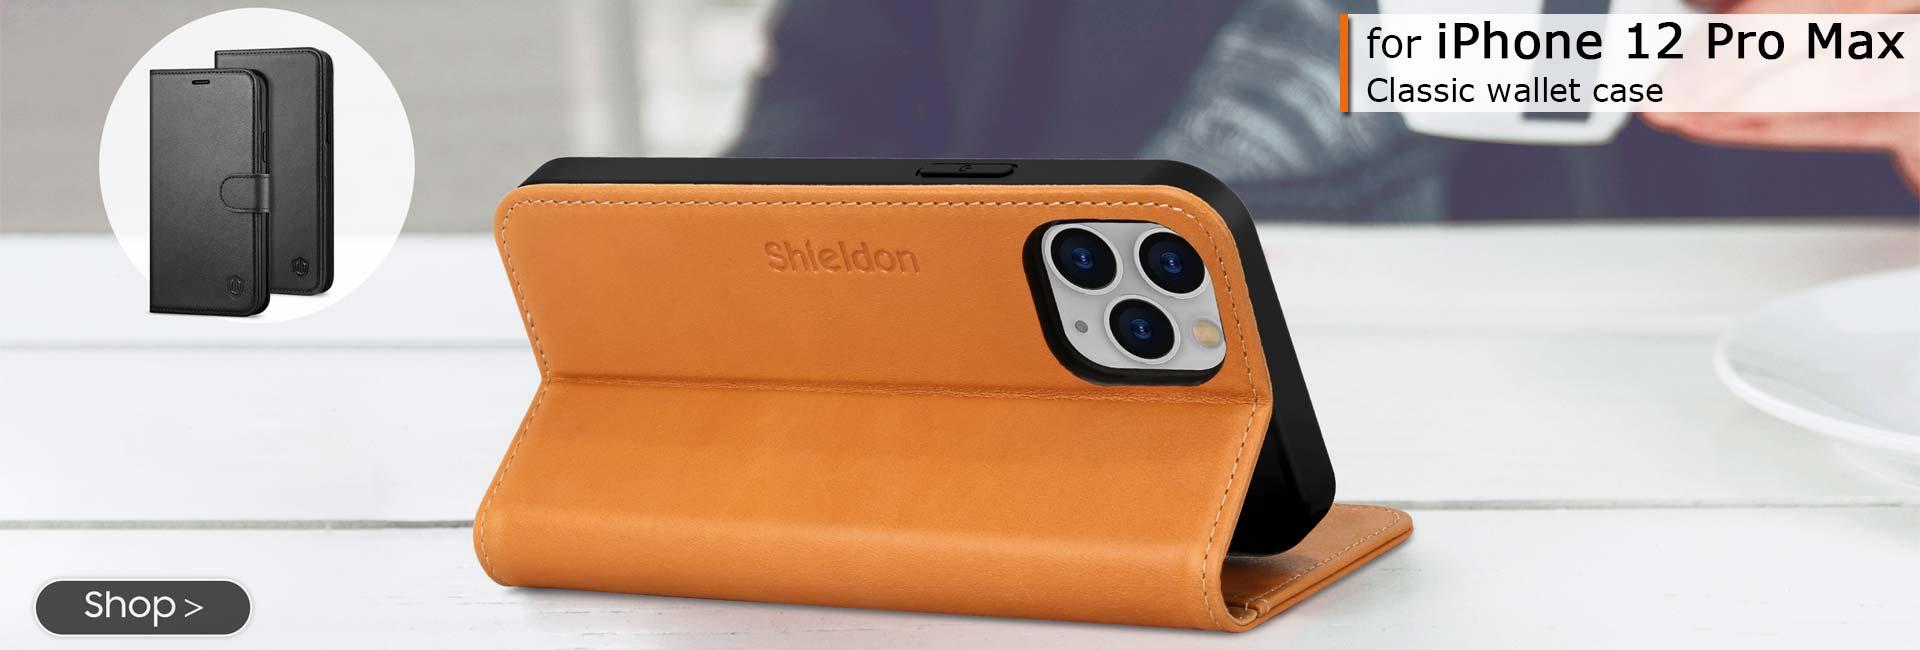 Shieldon iPhone 12 Pro Max Wallet Case